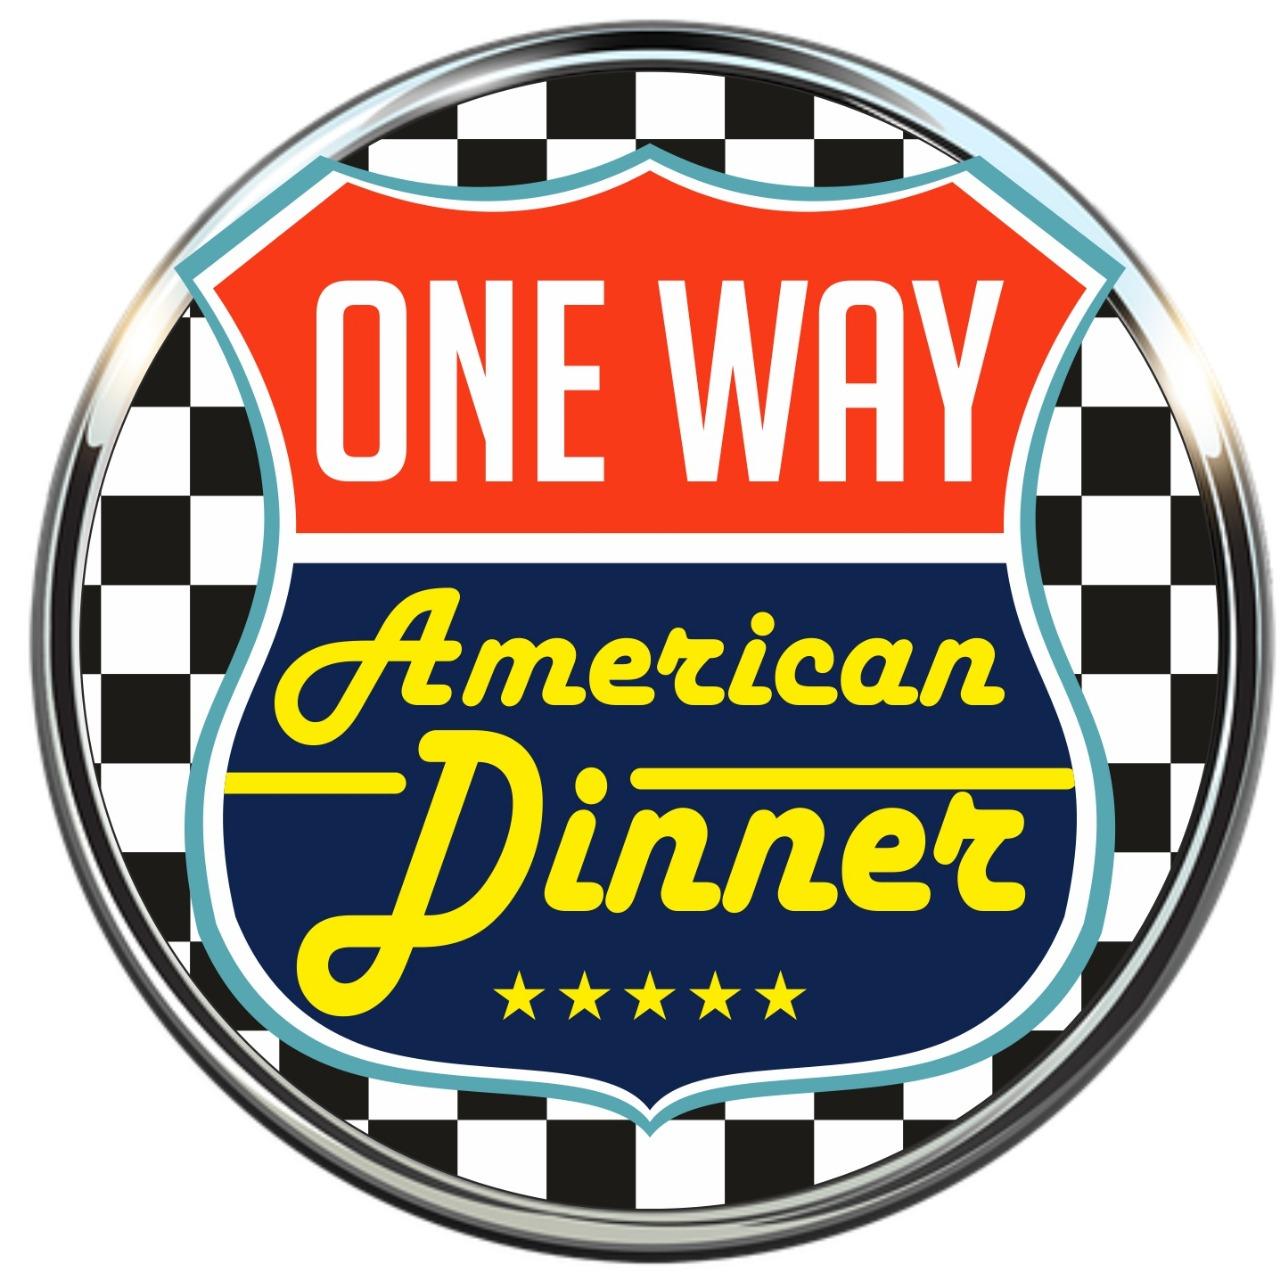 One Way American Dinner